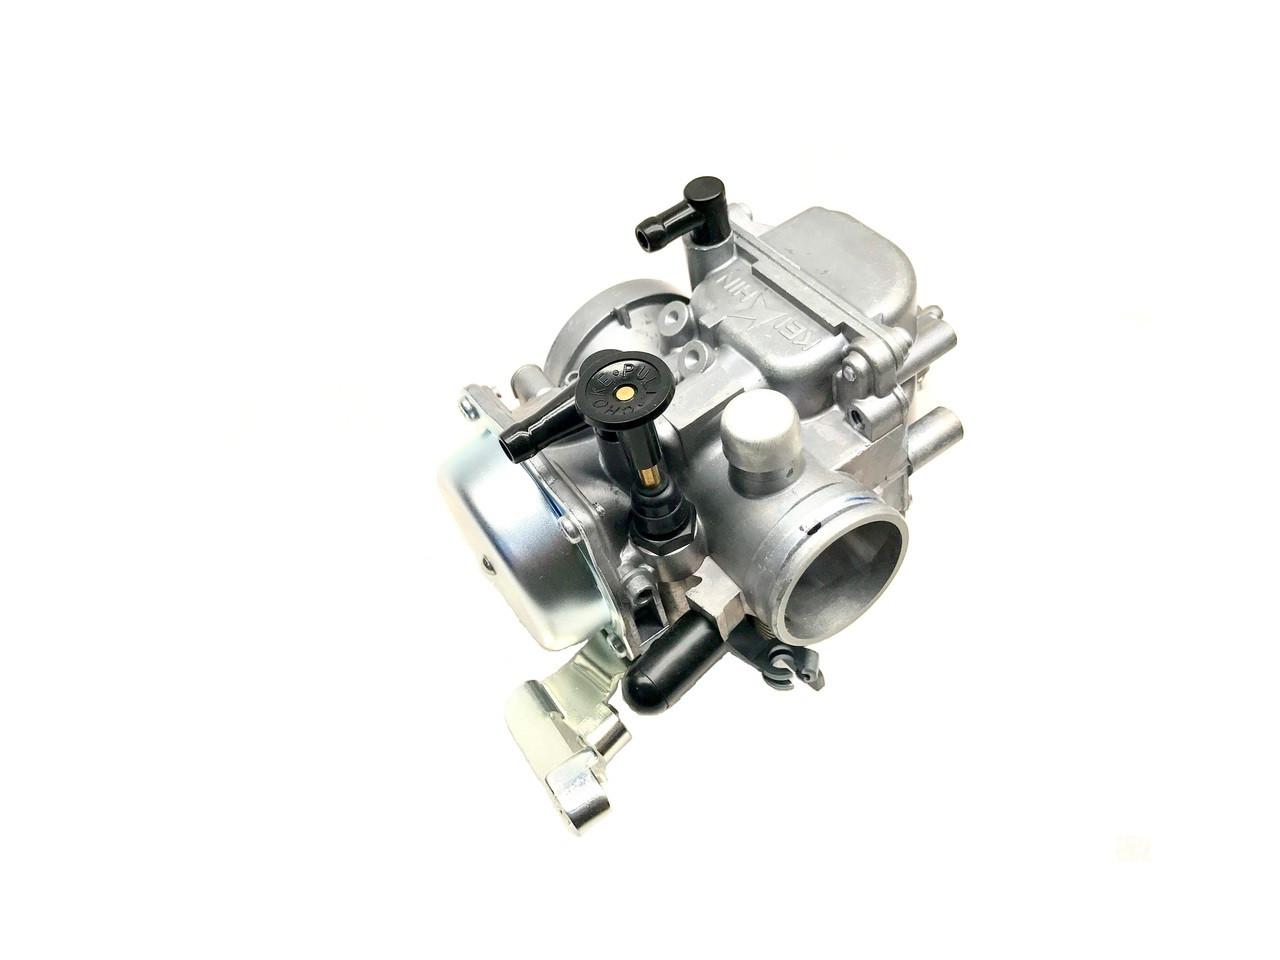 Carburetor Ural 750cc (Keihin CVK 32)